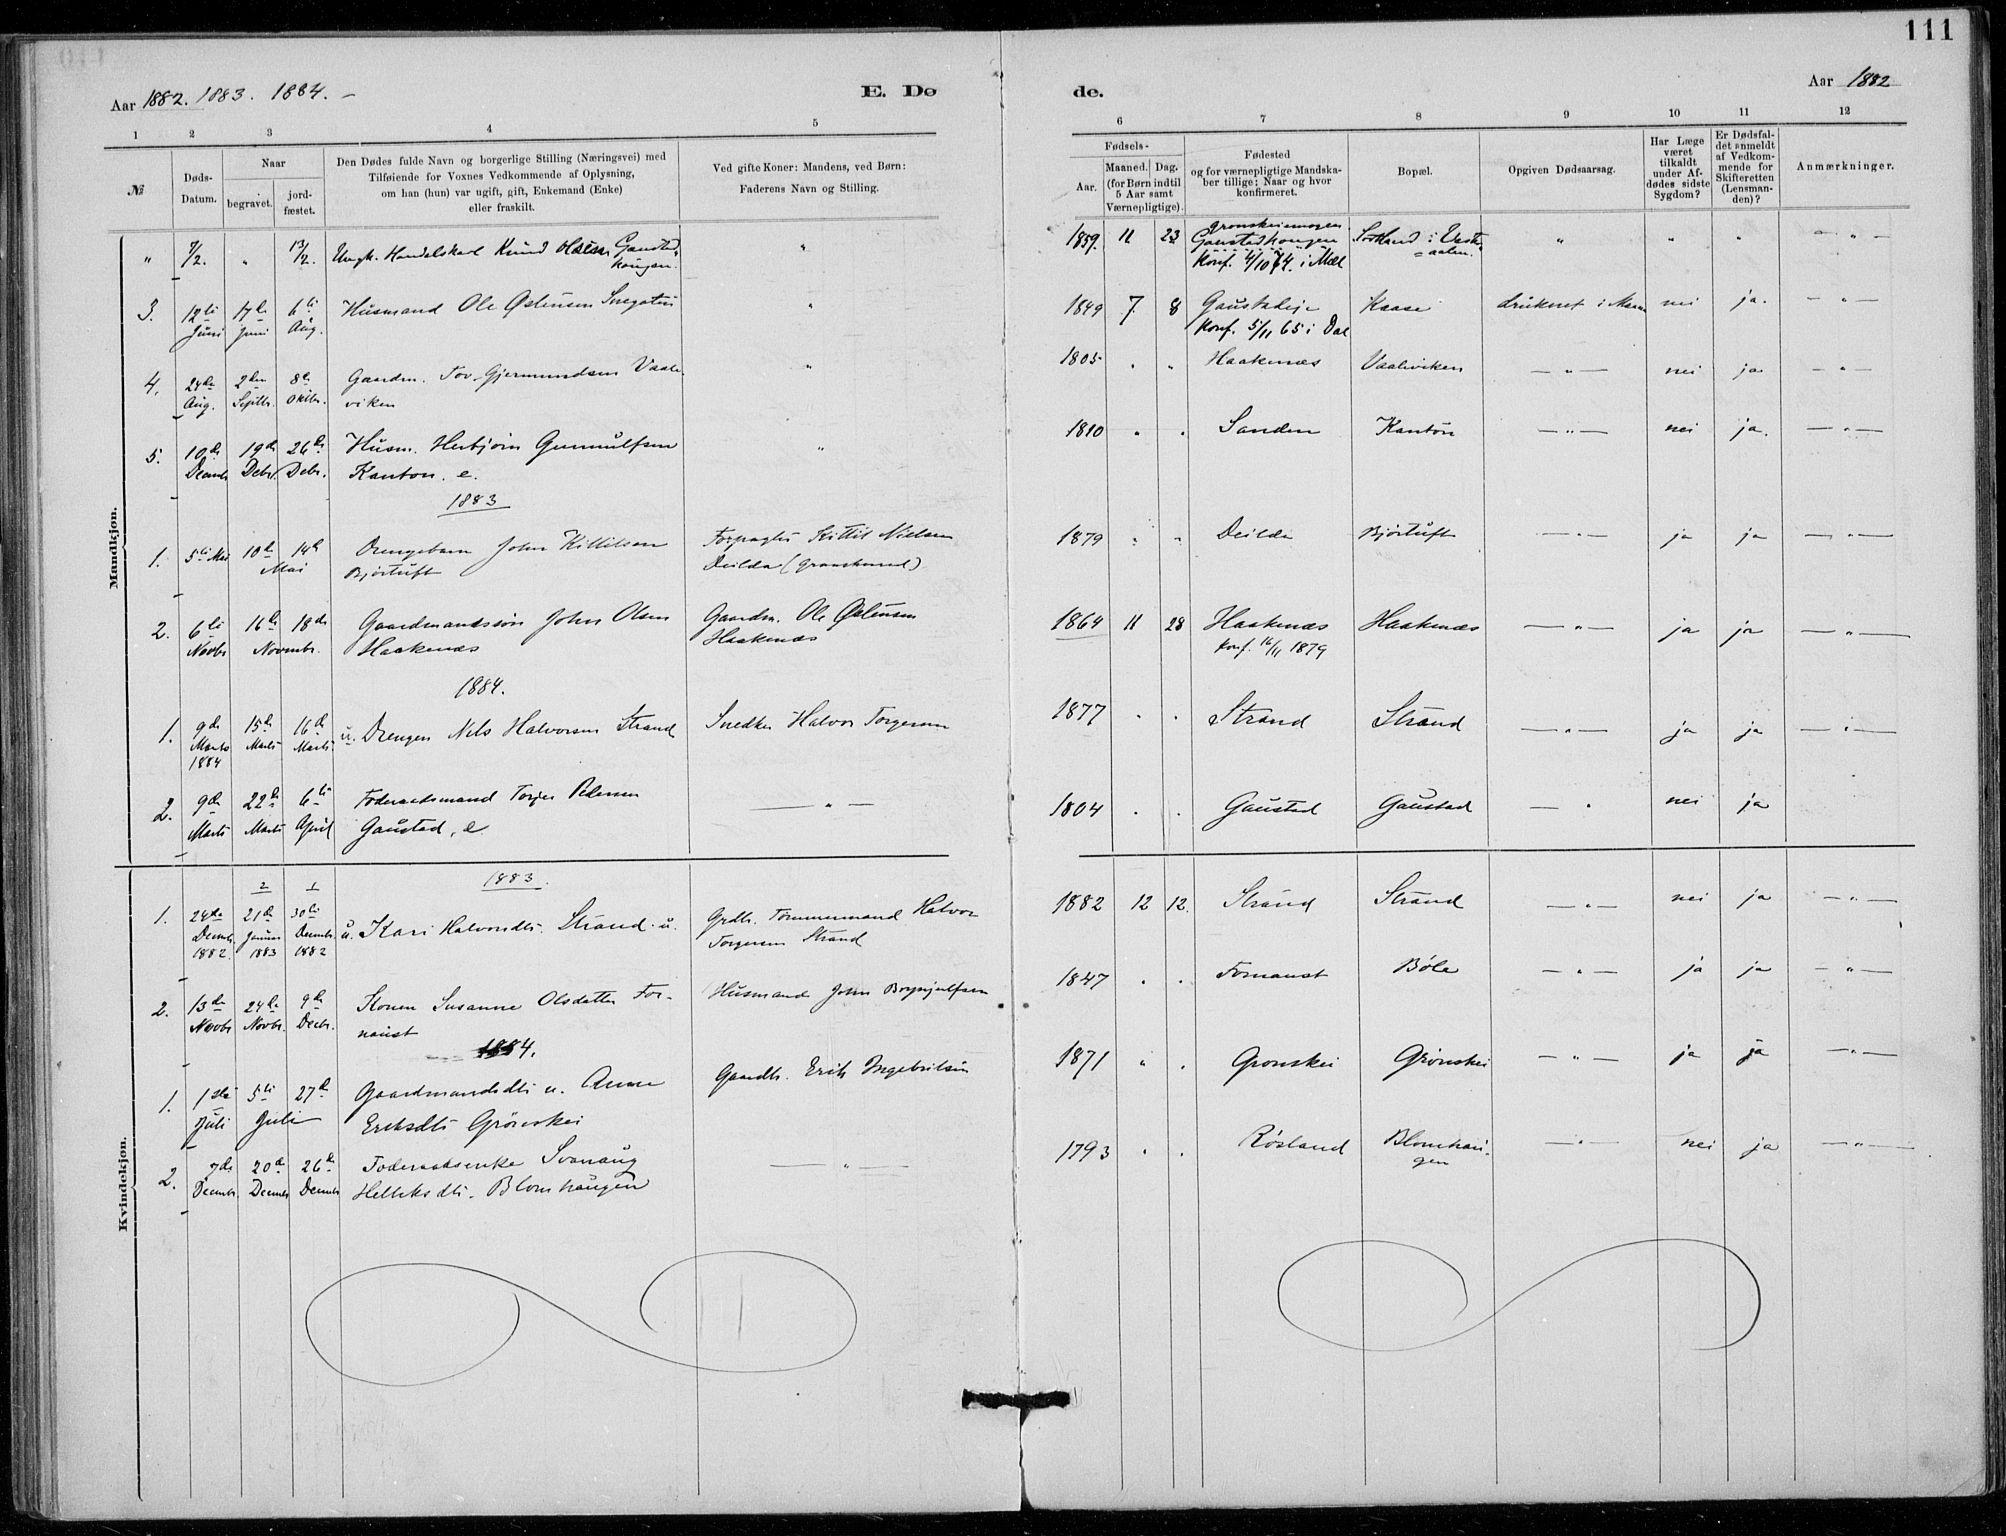 SAKO, Tinn kirkebøker, F/Fb/L0002: Ministerialbok nr. II 2, 1878-1917, s. 111